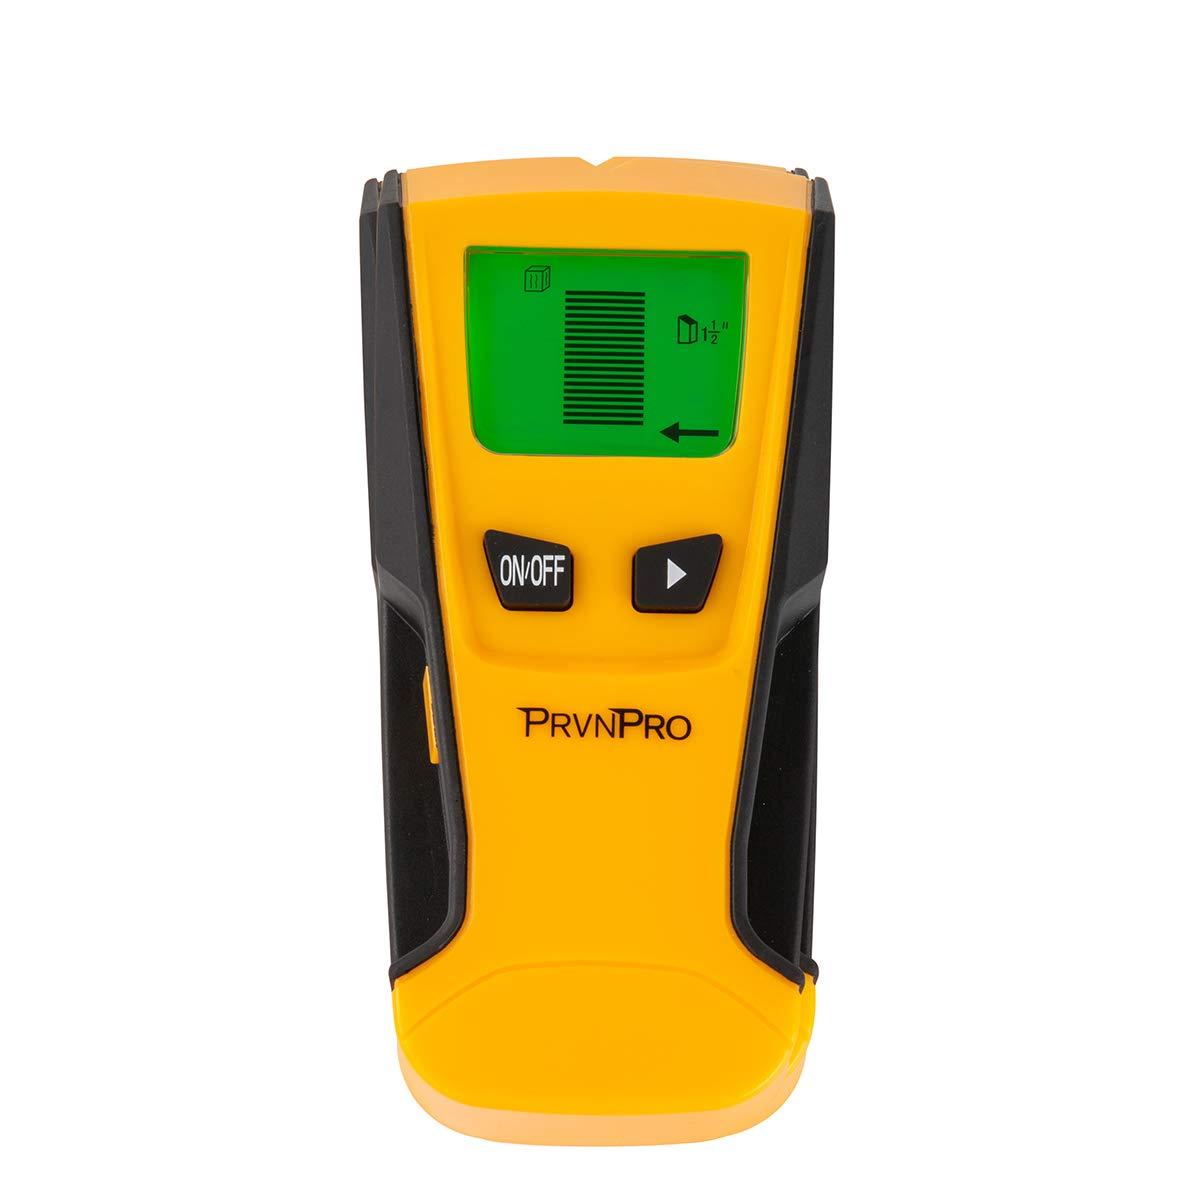 PrvnPro Stud Finder Wall Sensor Tool, Detects Wood, Metal and Alternating Currents